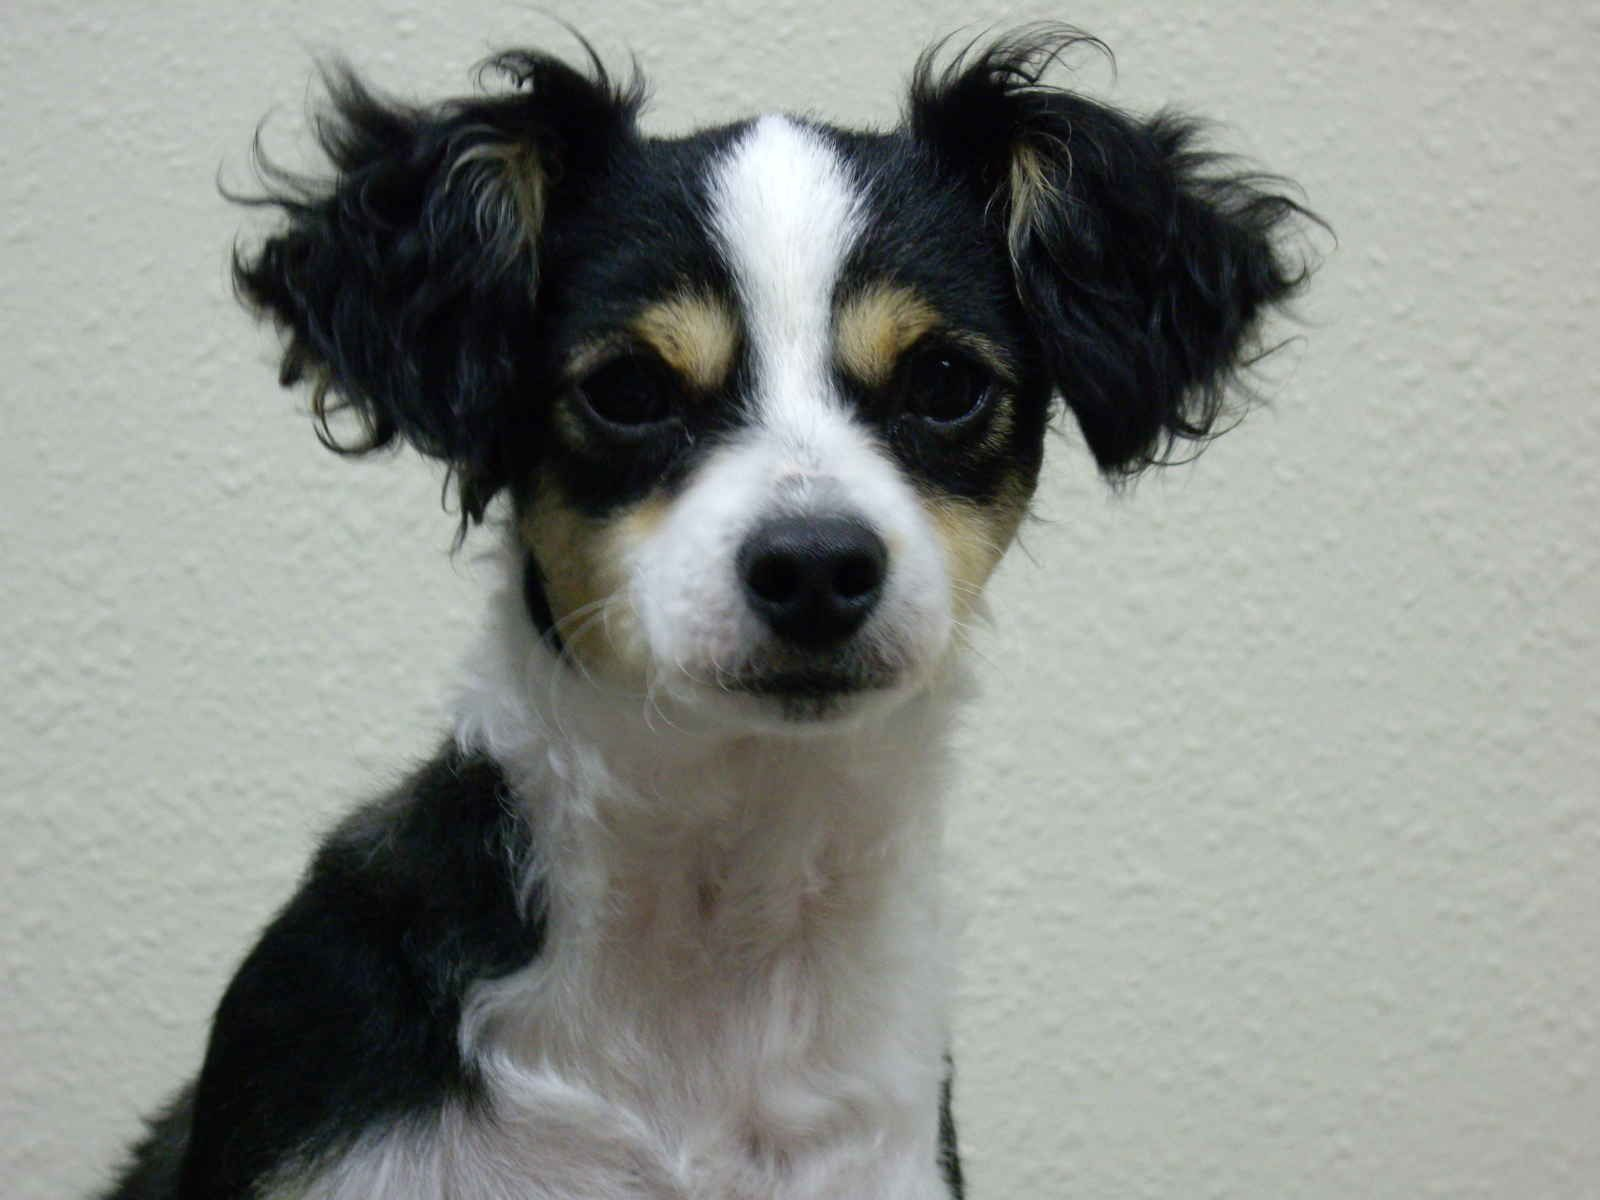 Teacup Poodle Chihuahua Mix Chihuahua Poodle Image Teacup